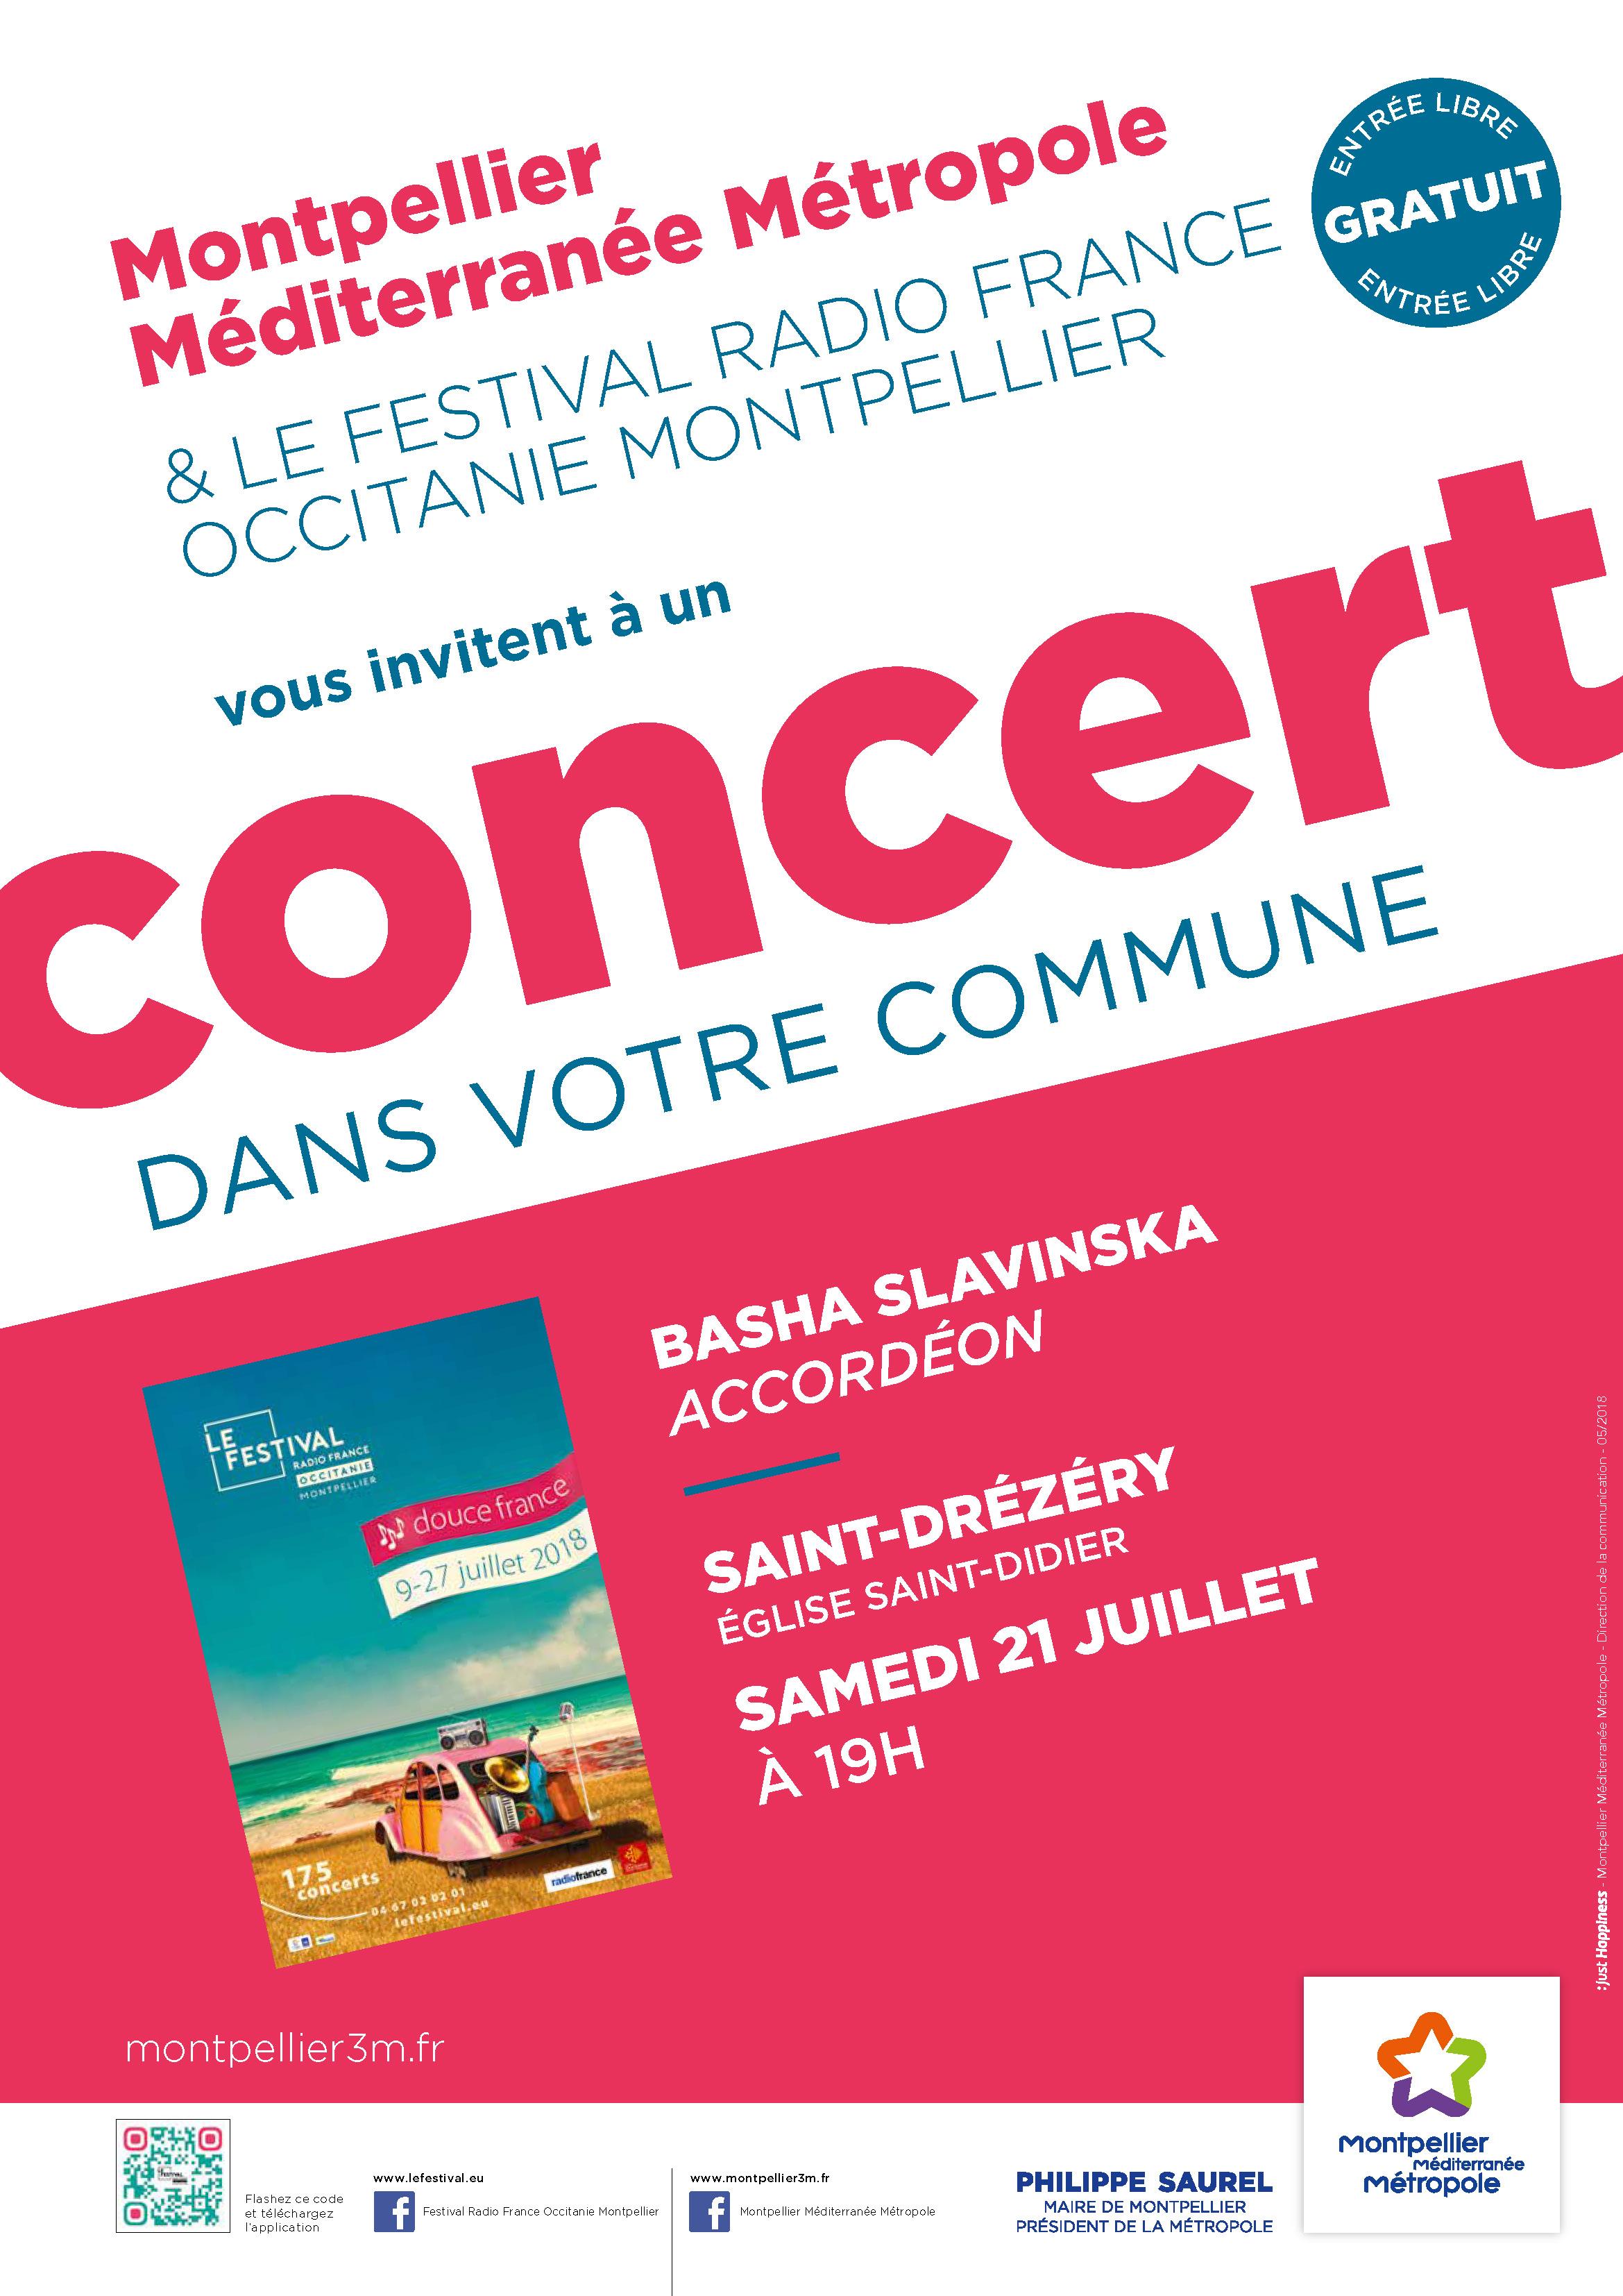 Festival Radio France Occitanie Montpellier   BASHA SLAVINSKA